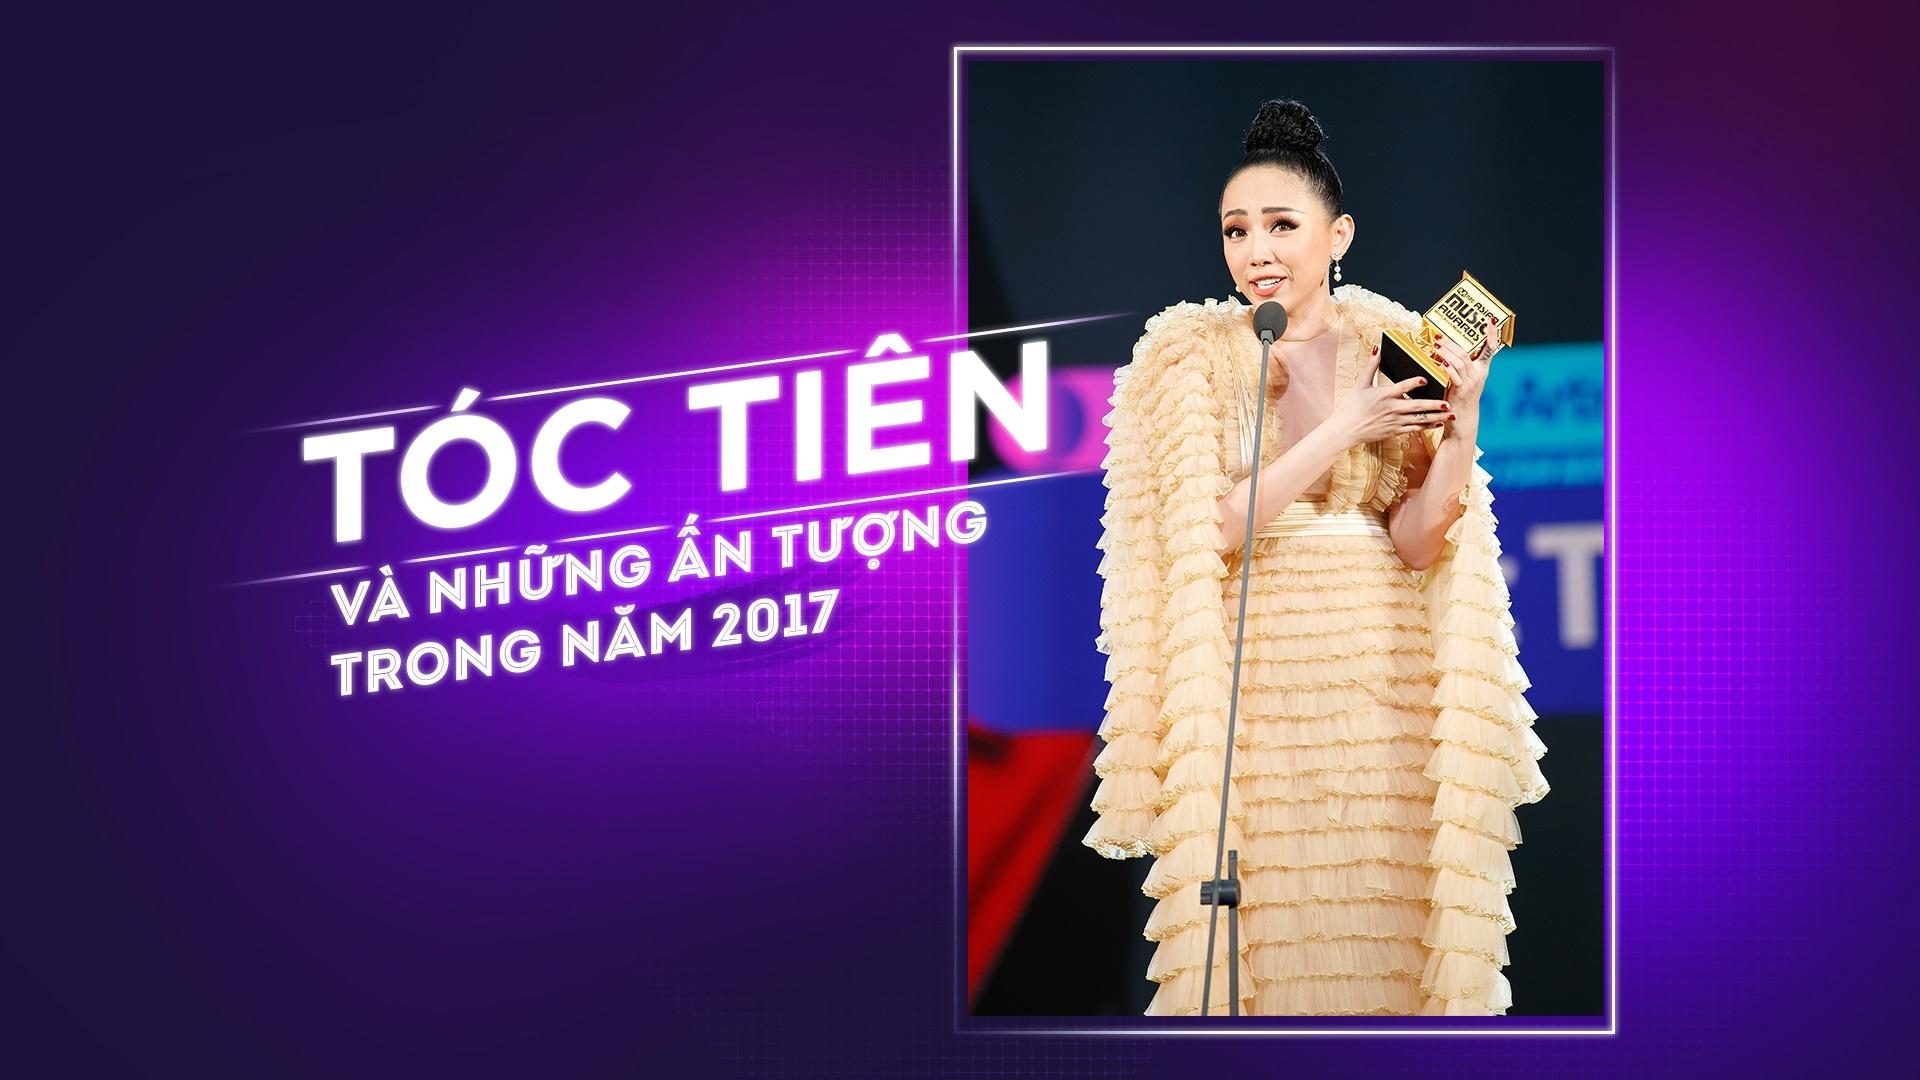 Toc Tien va nhung an tuong trong nam 2017 hinh anh 1